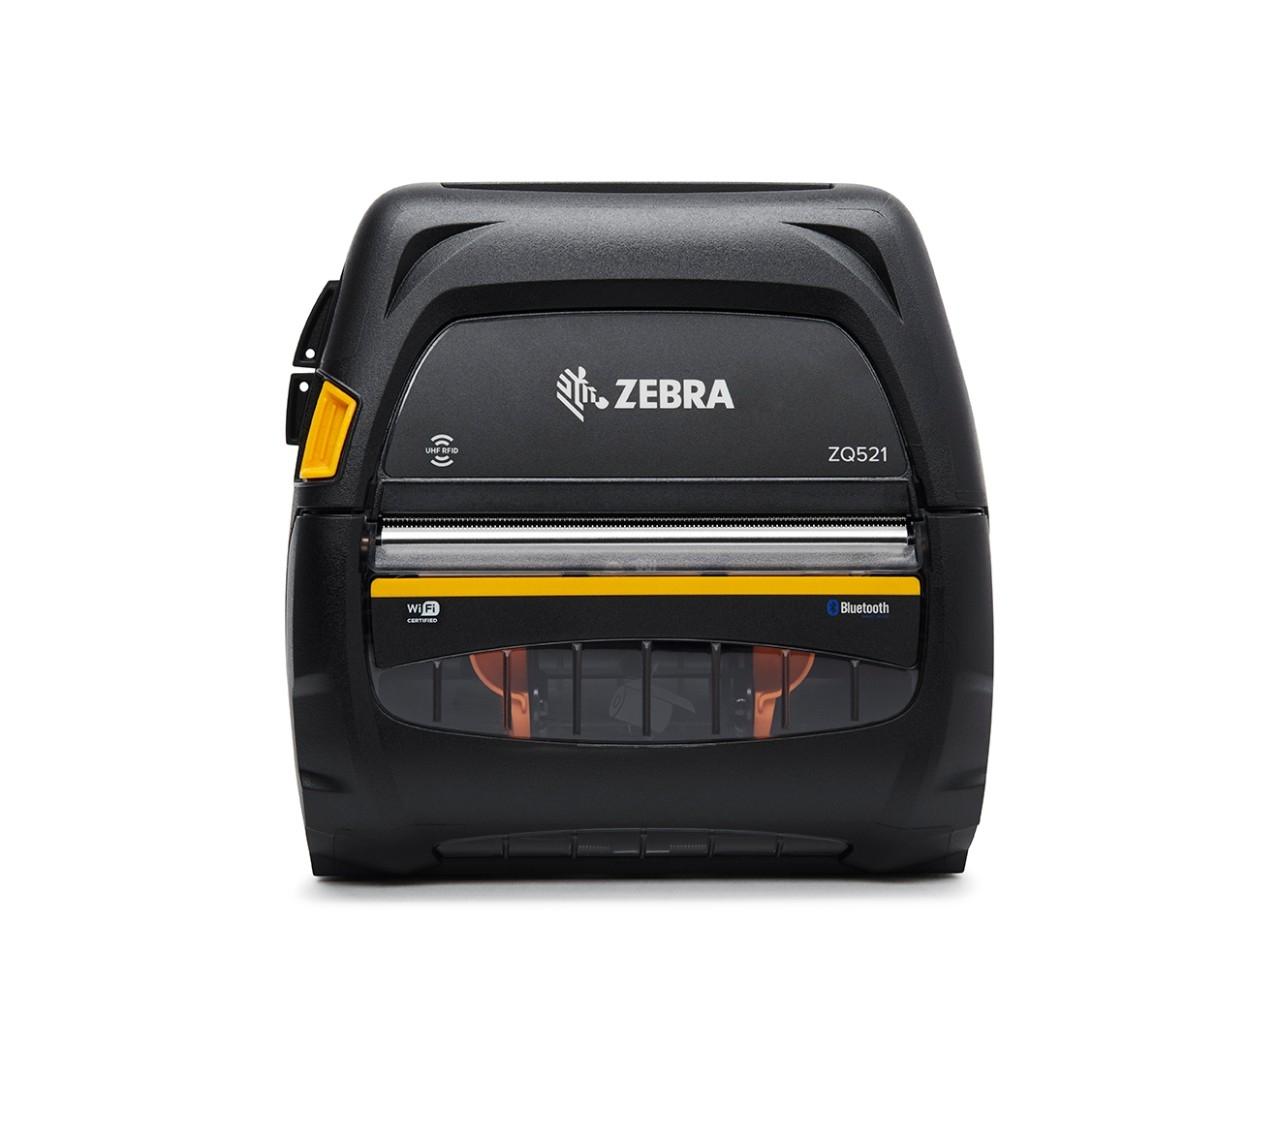 ZQ521 RFID モバイル プリンタ